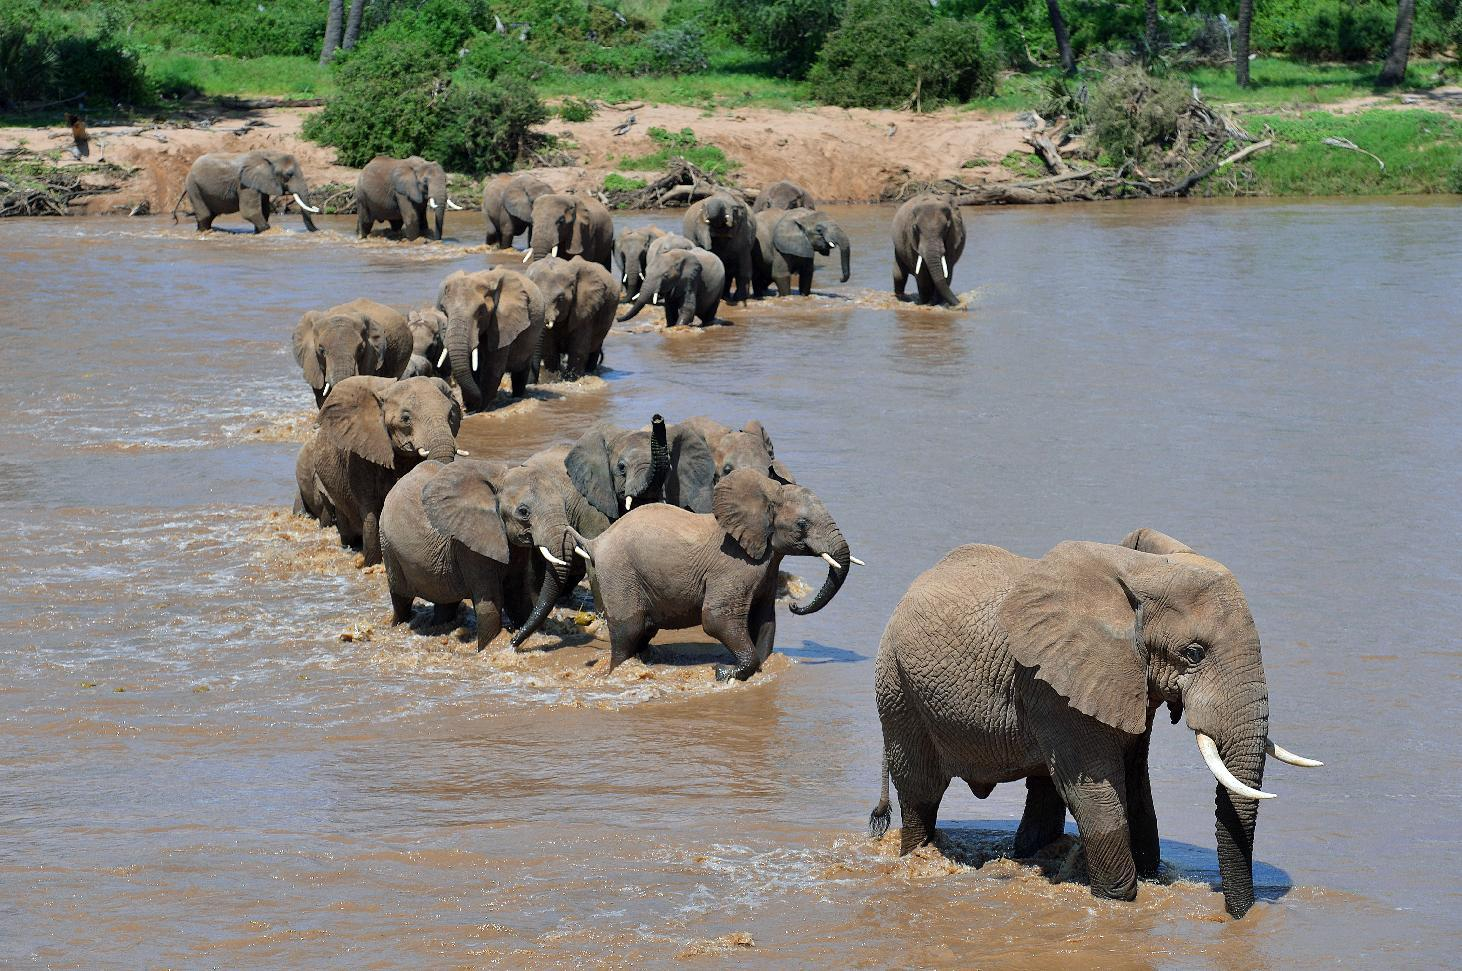 Elephants ford the Ewaso Nyiro river in Kenya's Samburu game reserve on May 8, 2013 (AFP Photo/Carl de Souza)